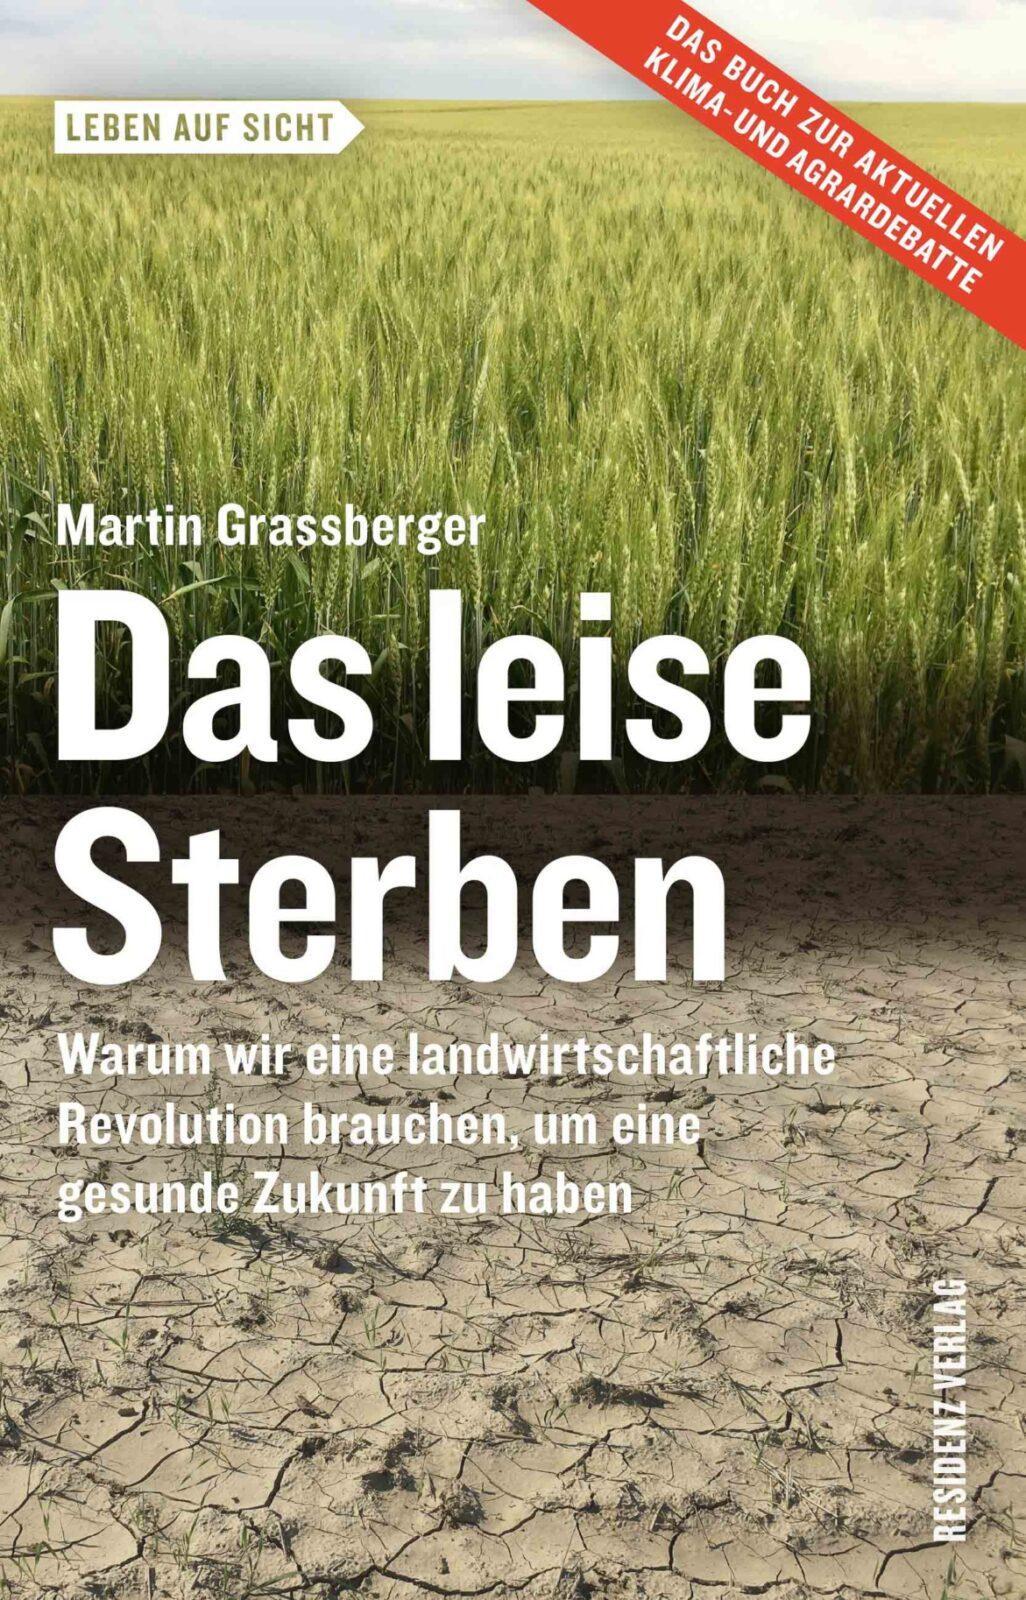 Madamewien.at, Martin Grassberger, Klimawandel,